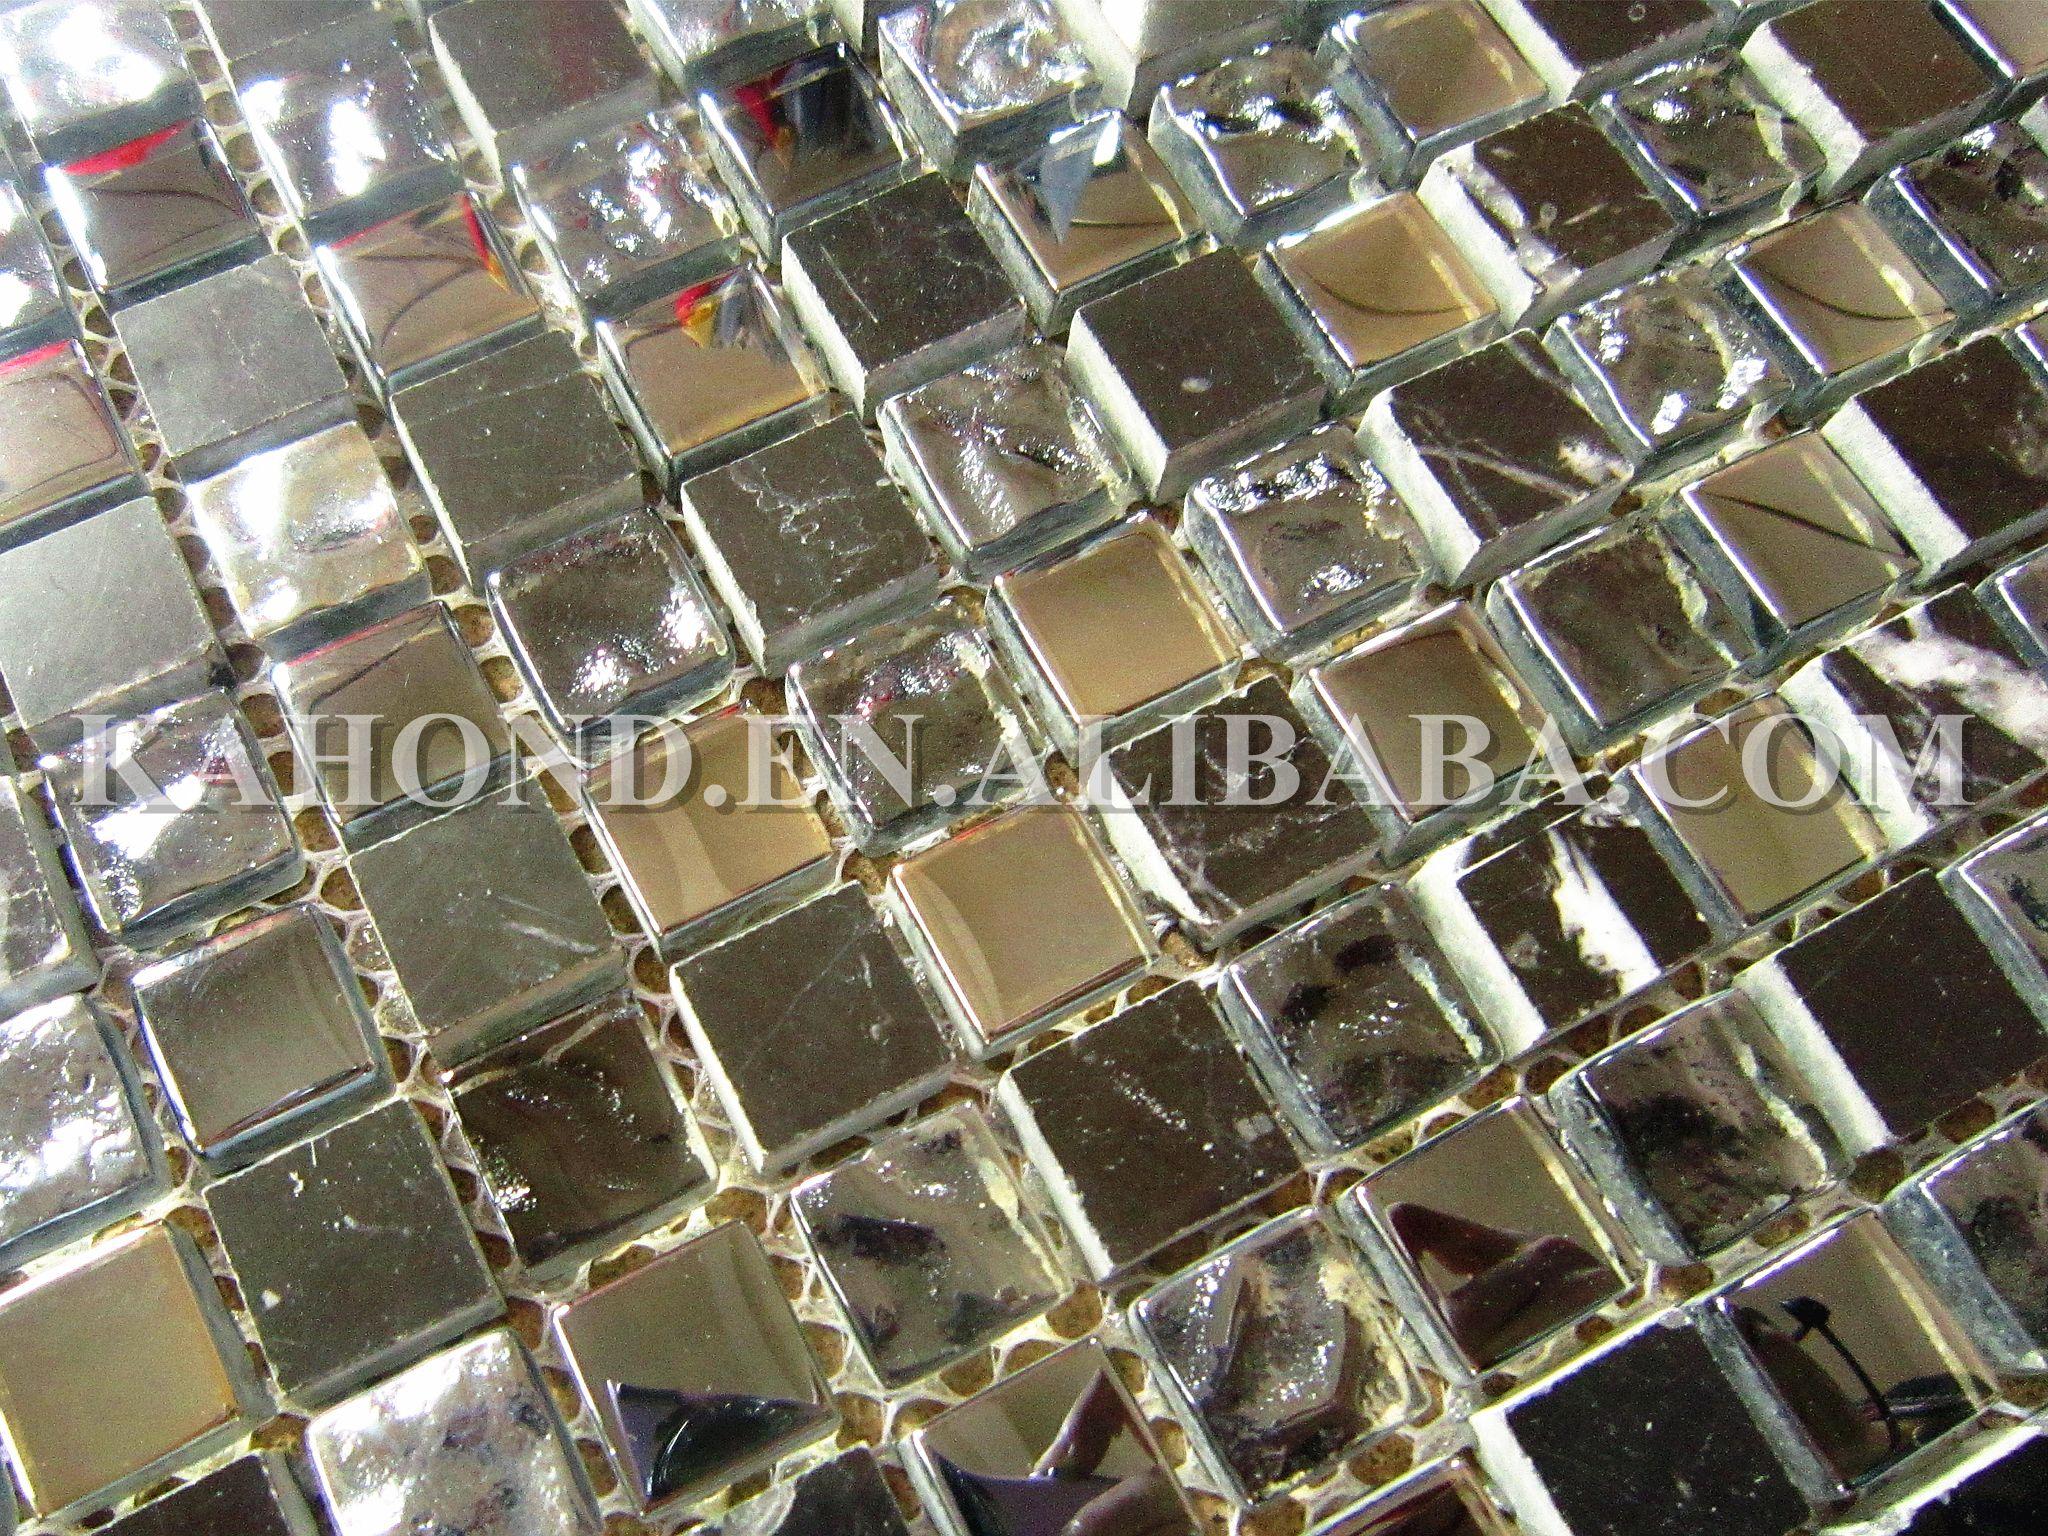 5 8 X 5 8 Black Crystal Glass And Nero Marquina Marble Mix Tumbled Mosaic Tiles Mosaic Glass Mosaic Tiles Glass Mosaic Tiles